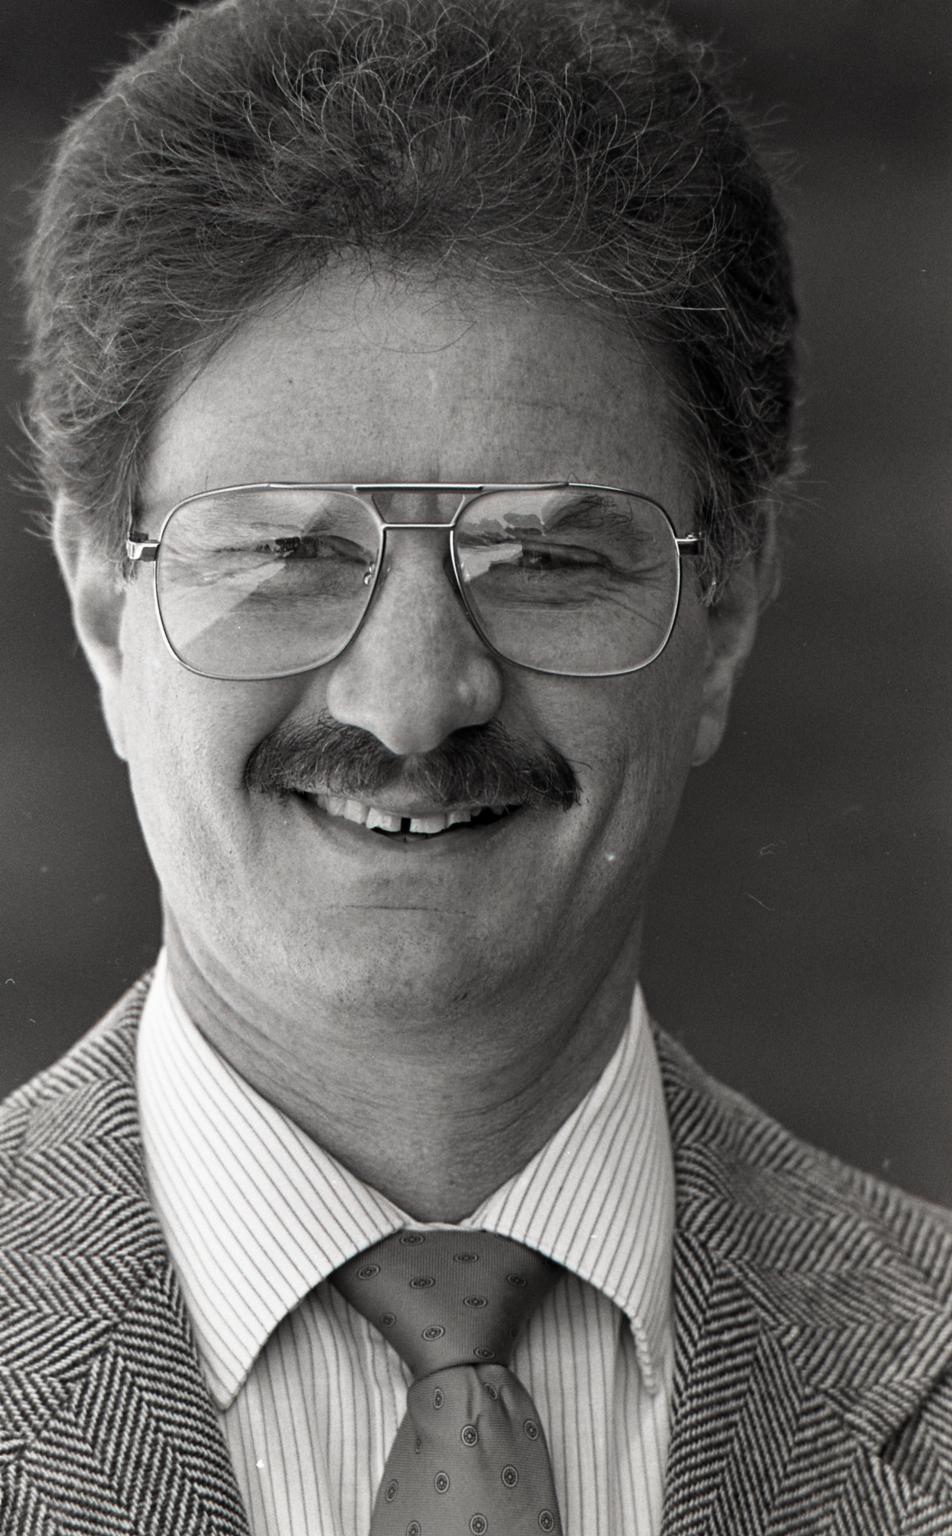 Hurwitz self portrait